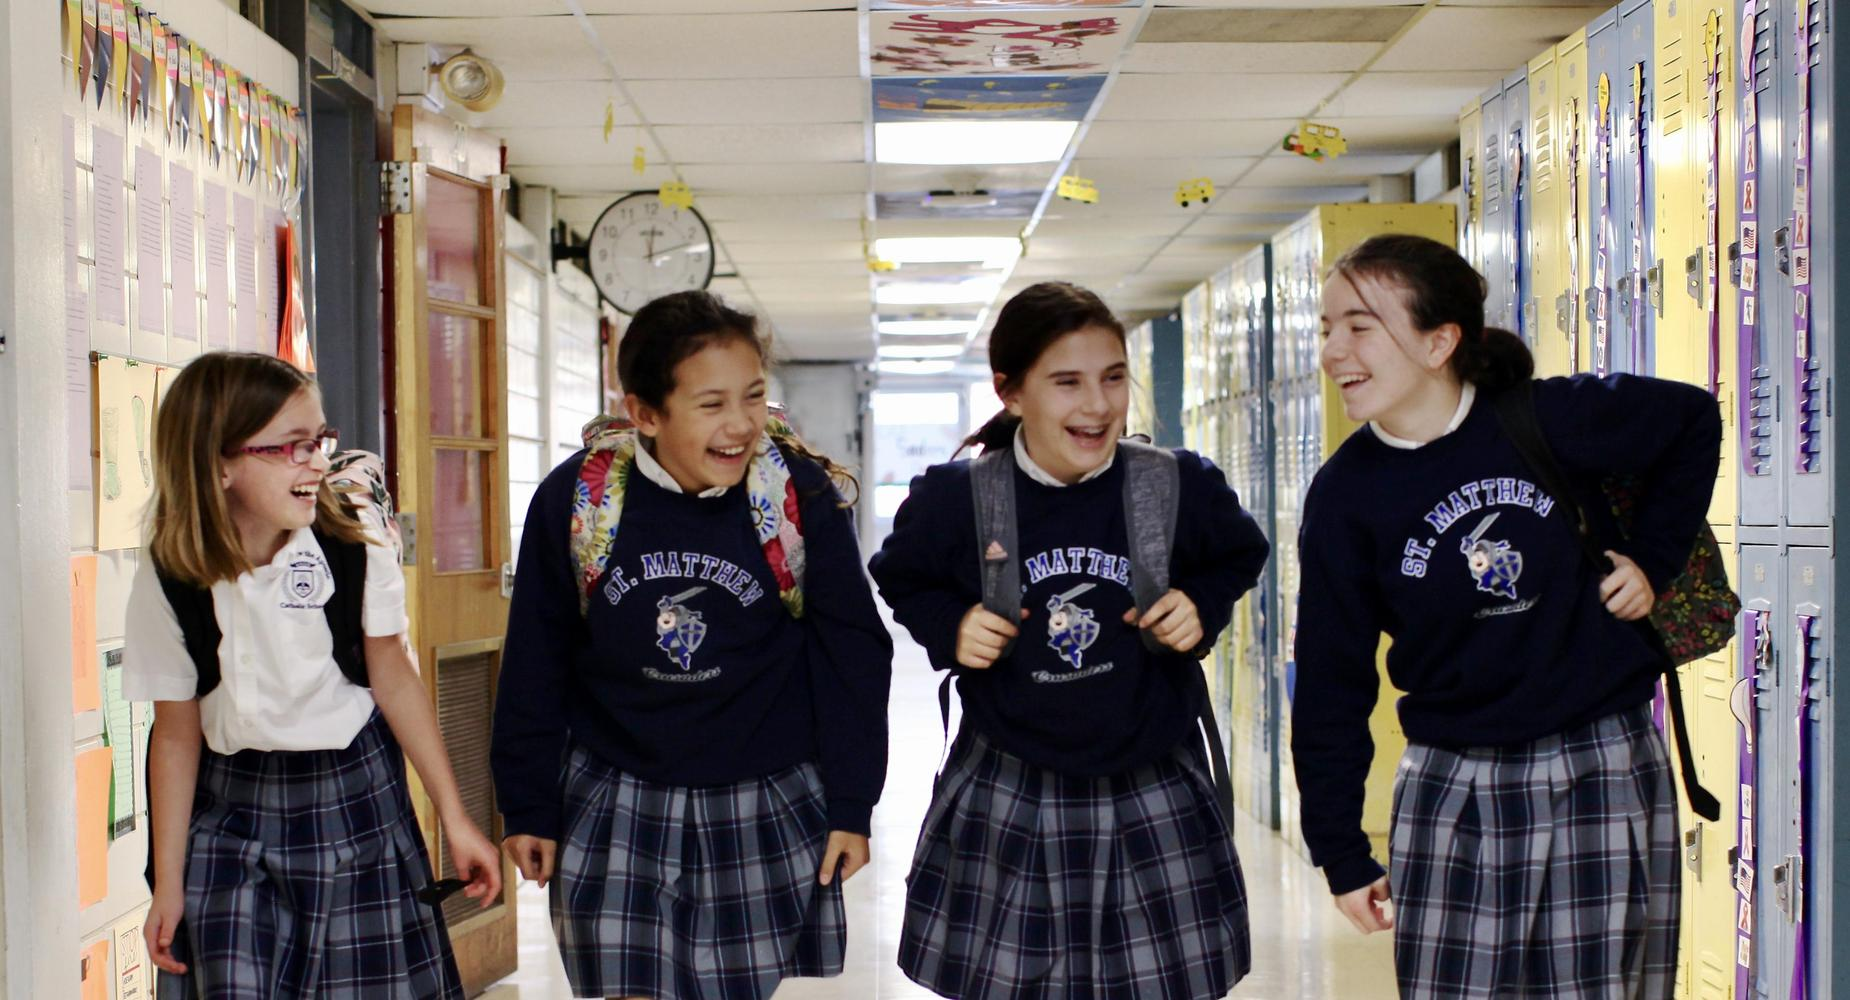 Middle School Girls in Hallway